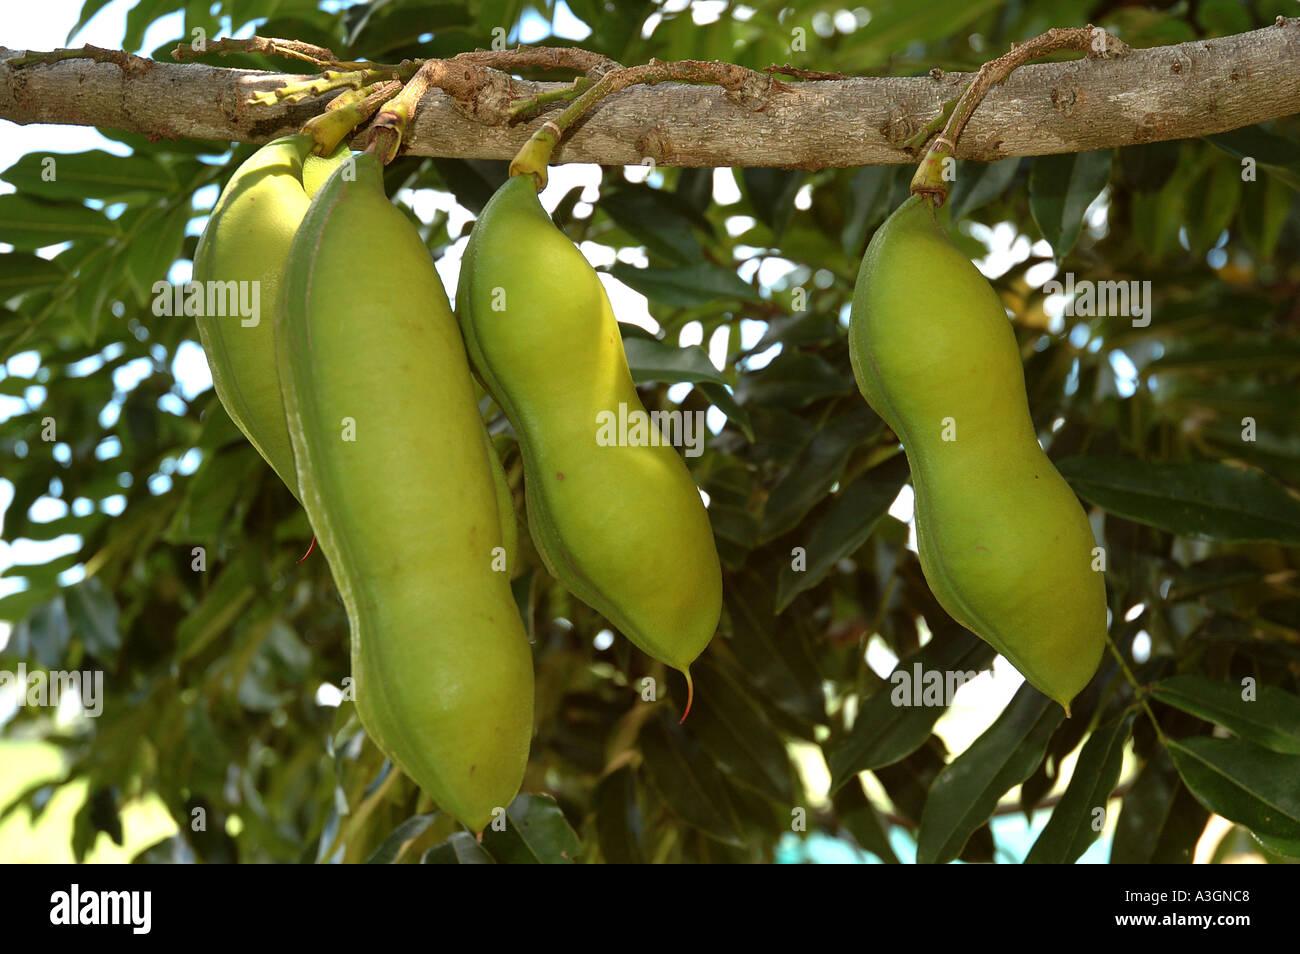 Black Bean Seed Pods Castamospermum Australe Rainforest